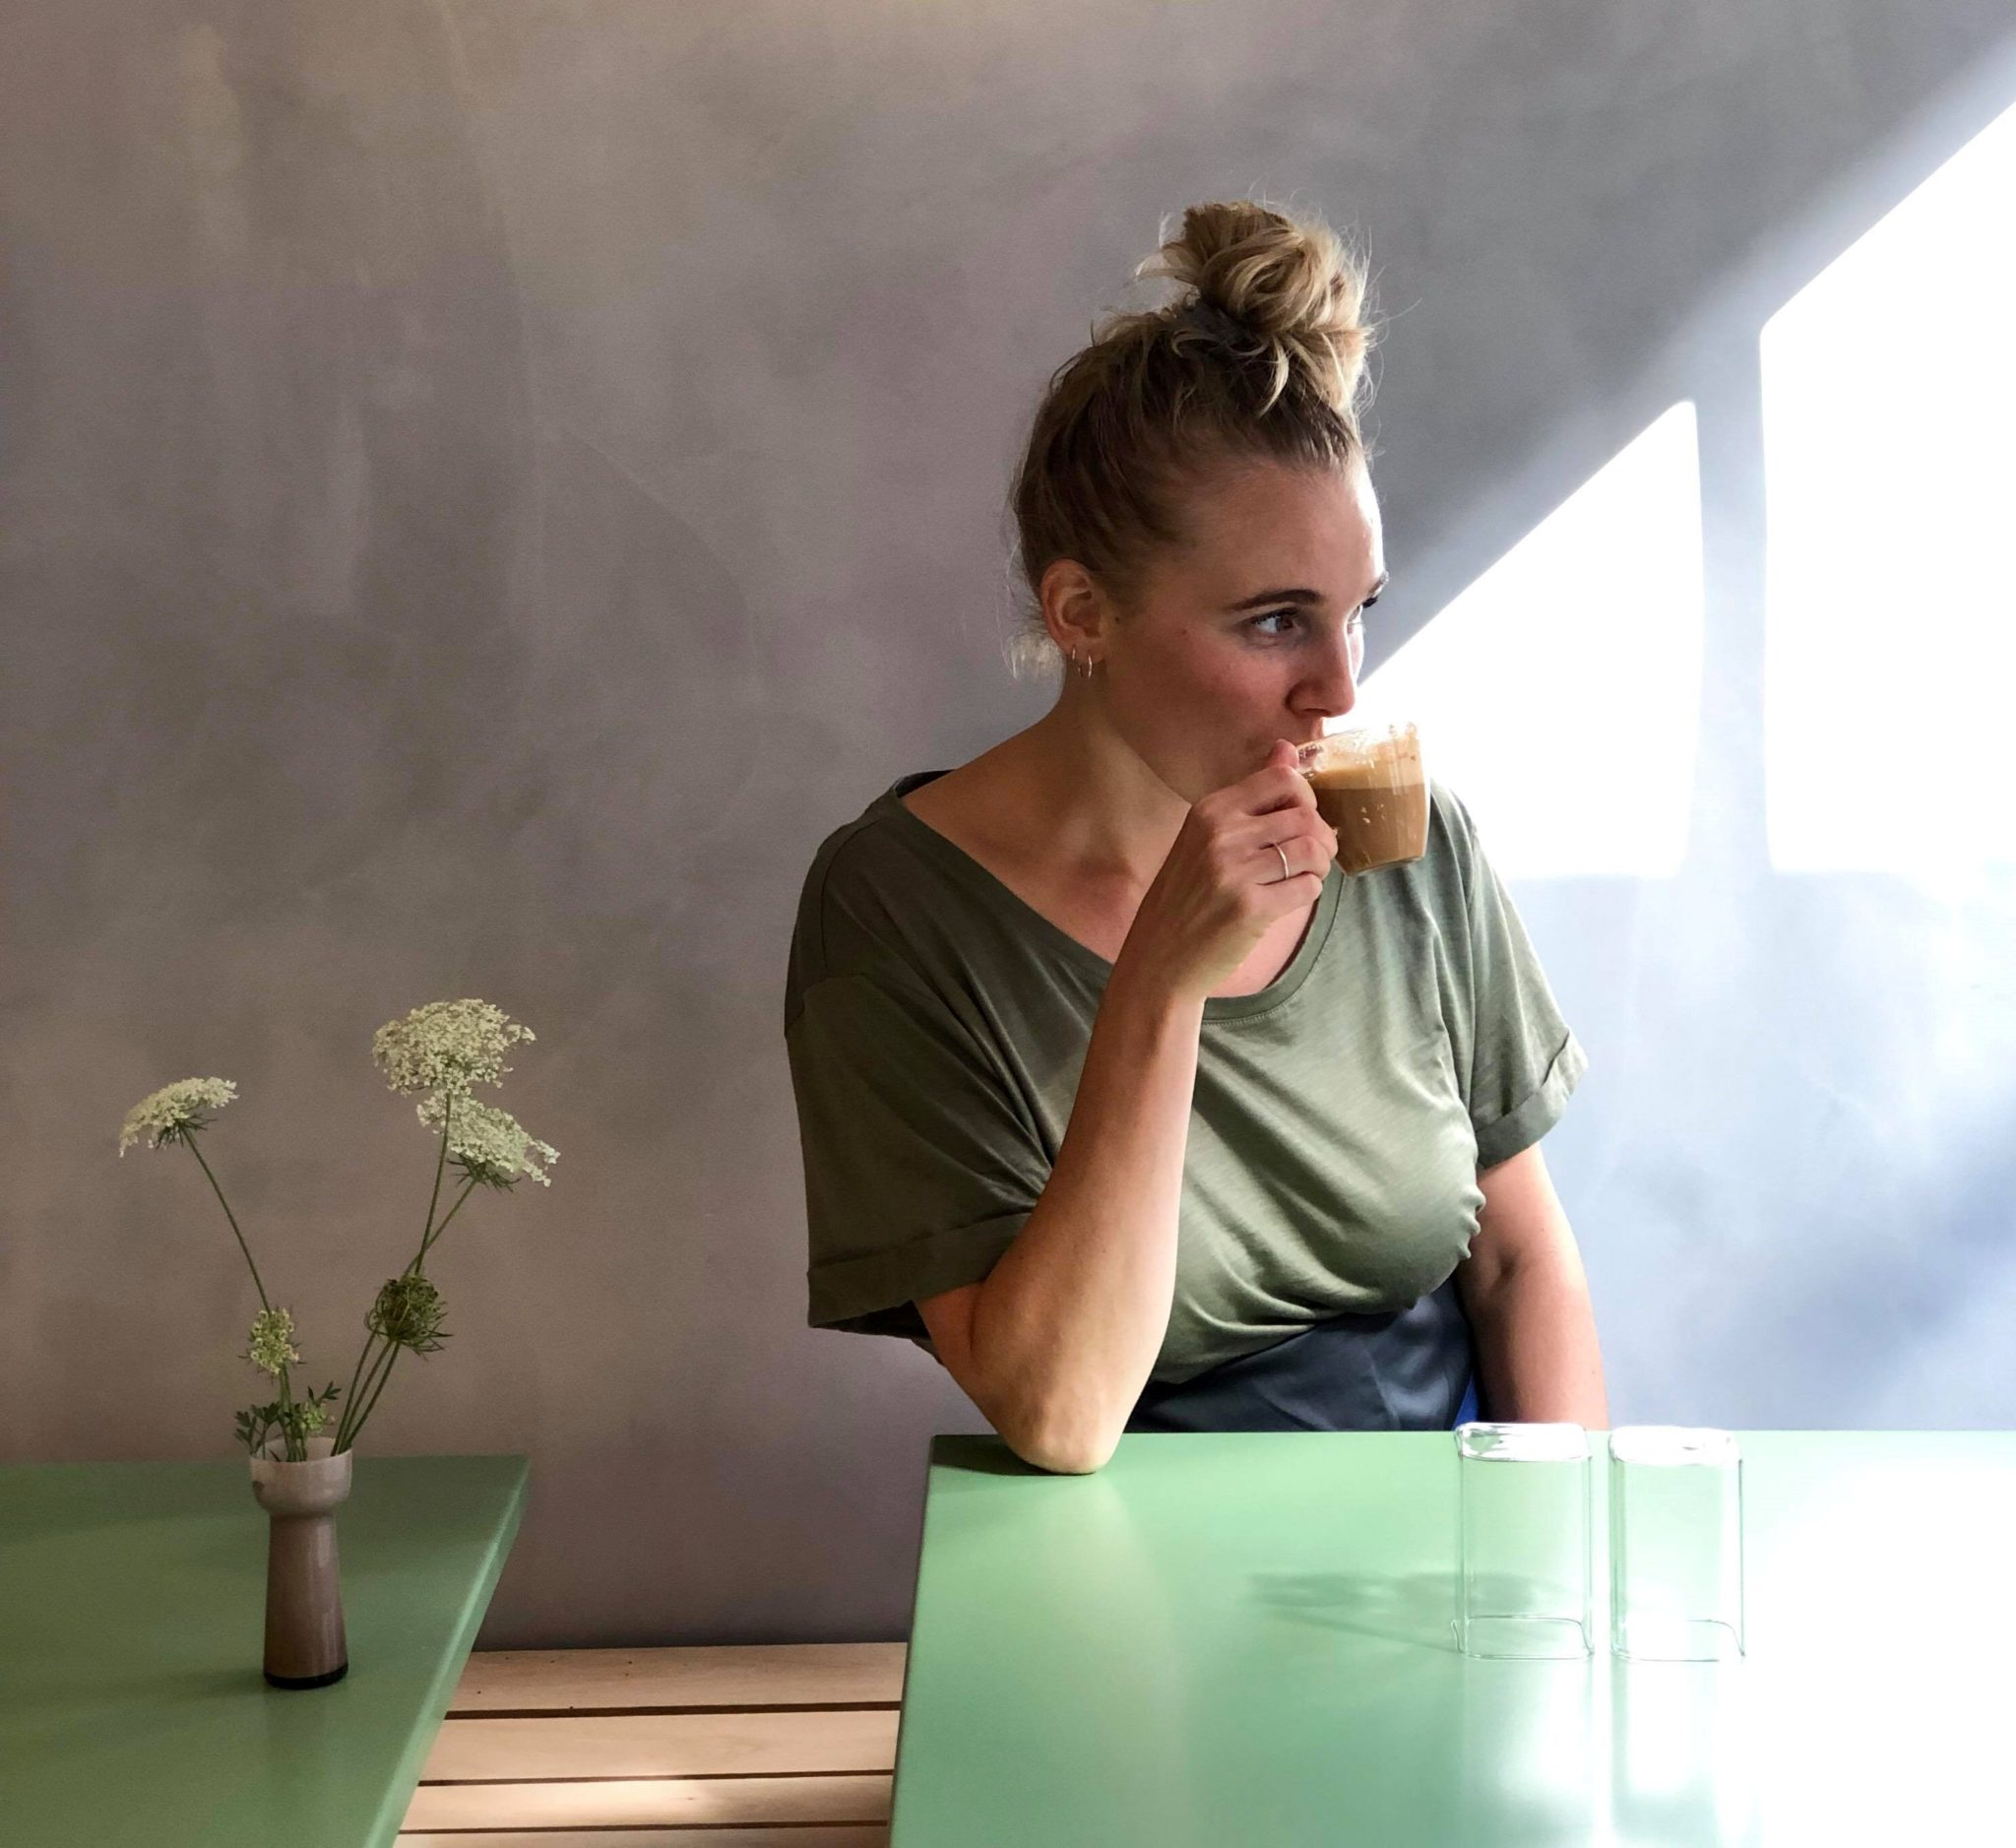 Ny café i Aarhus satser på det skæve måltid